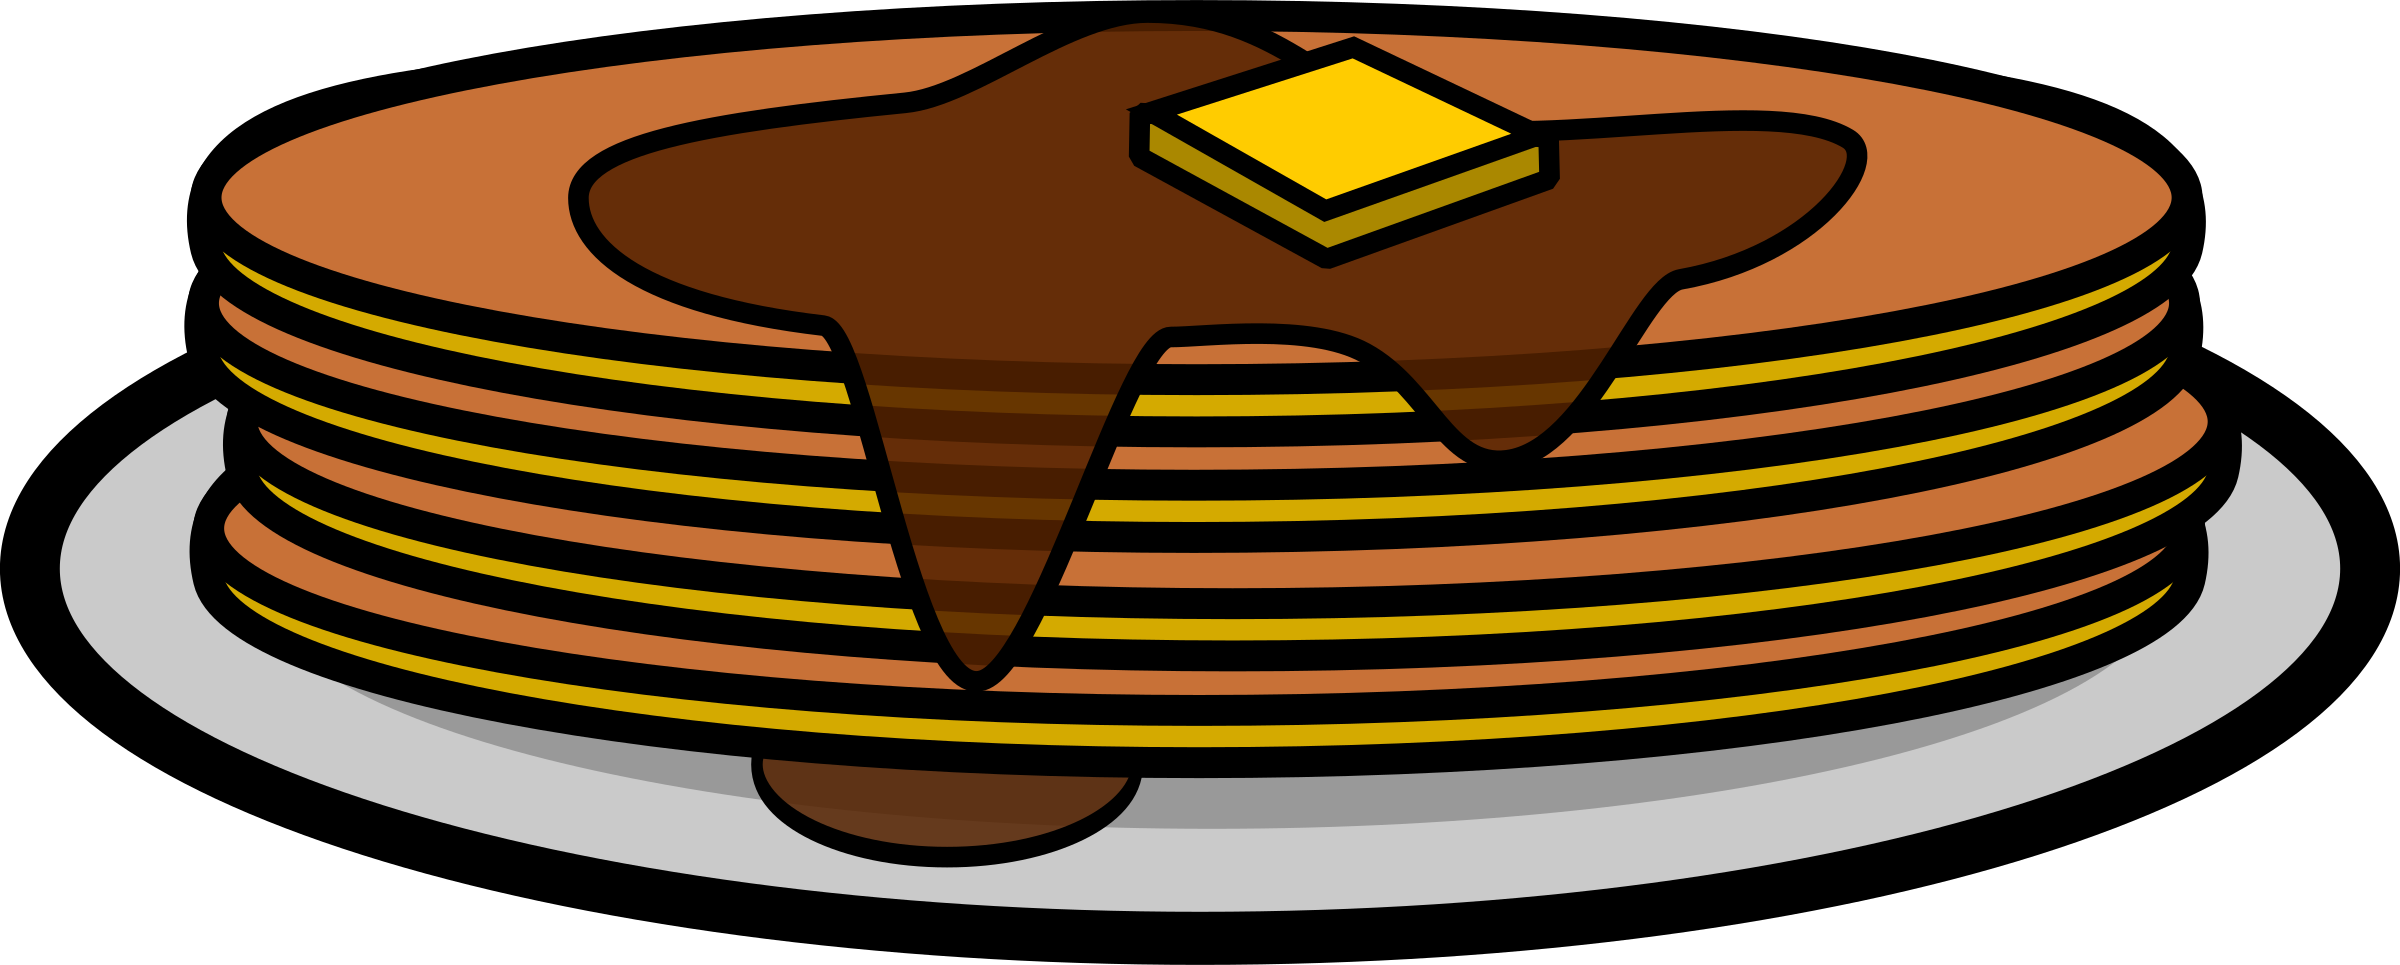 Clipart - Pancakes